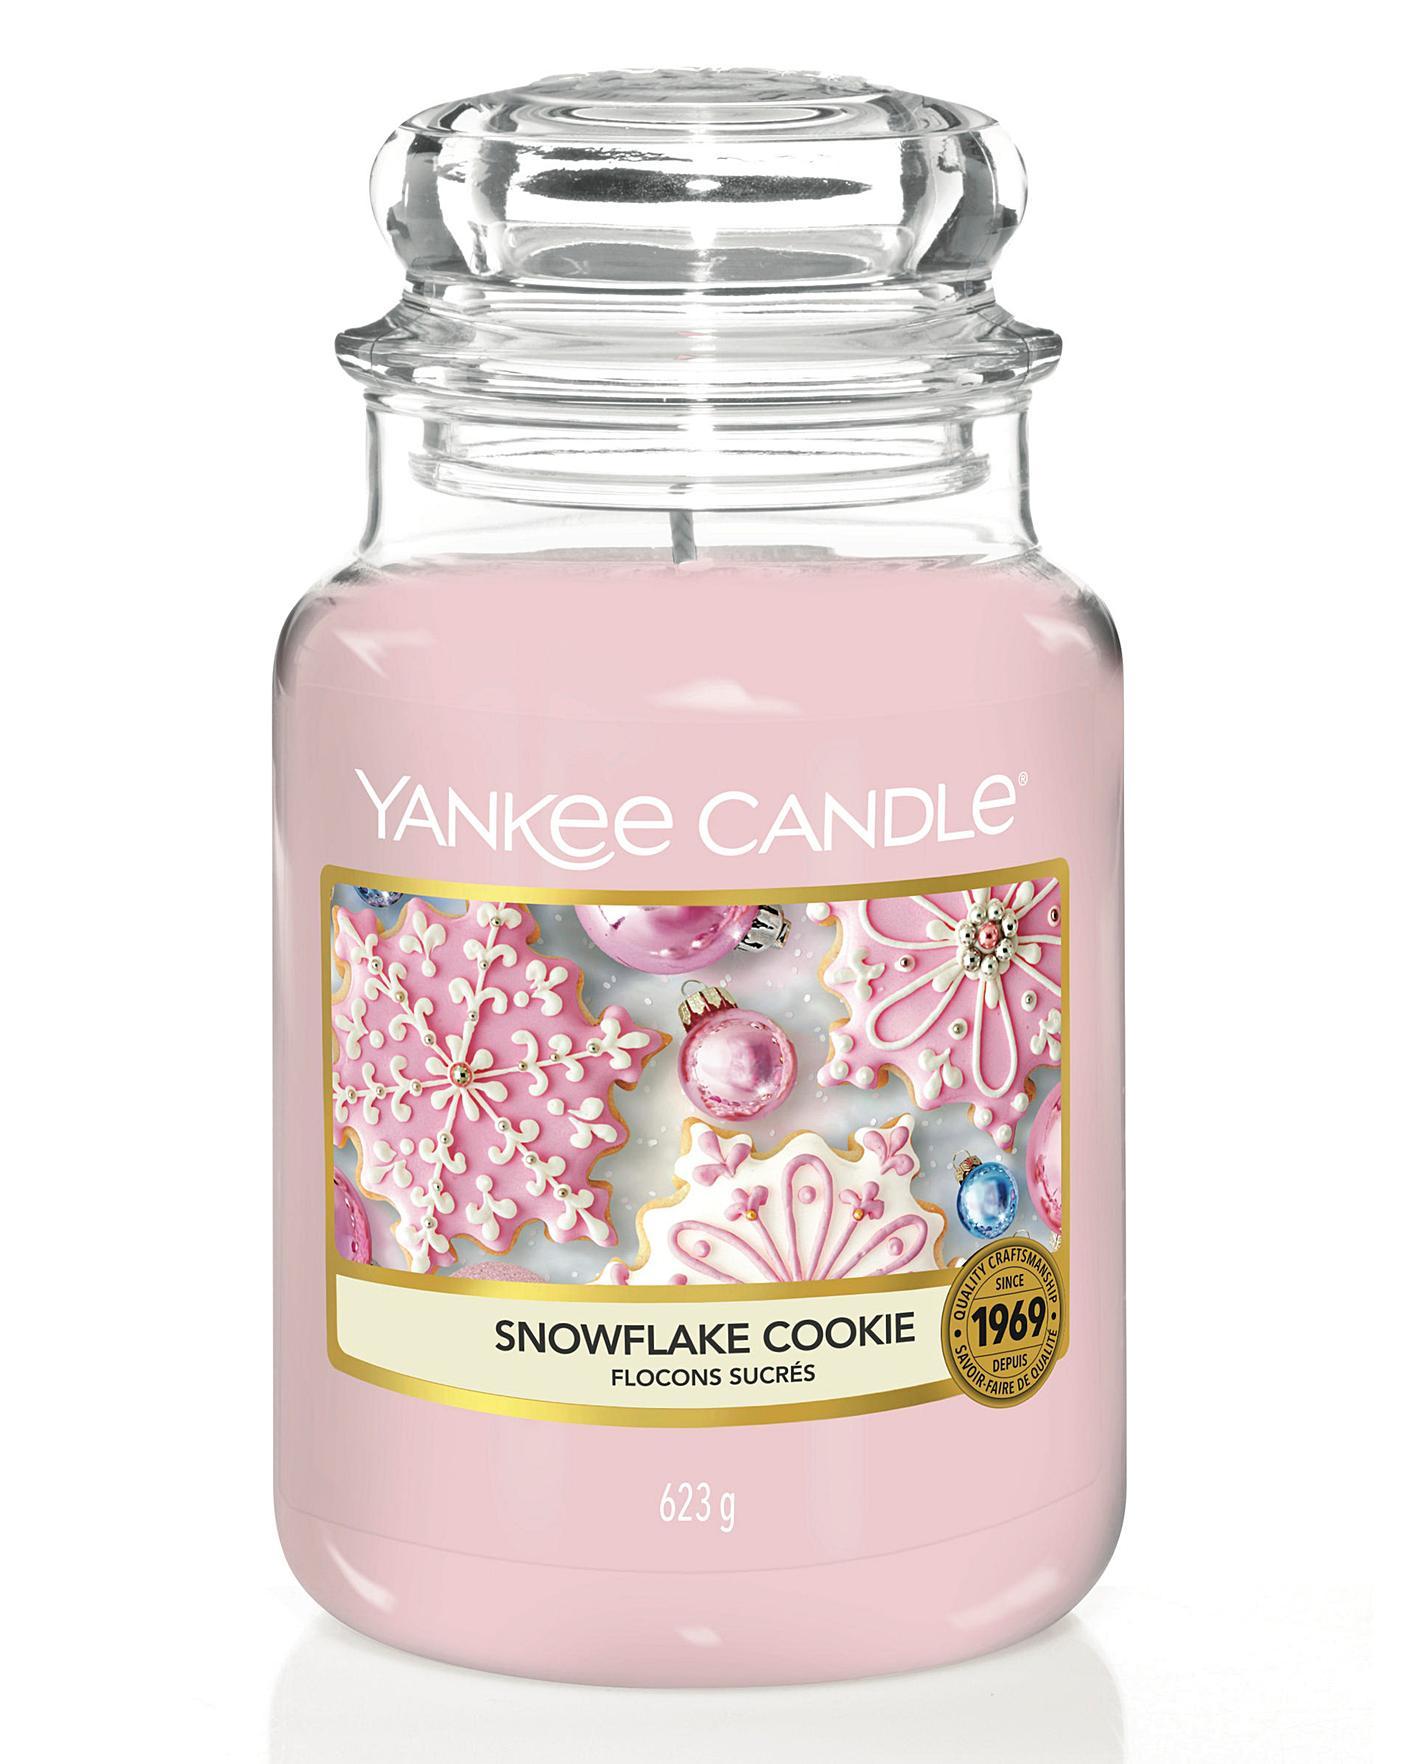 Snowflake Cookie Yankee Candle Large - cookie ideas